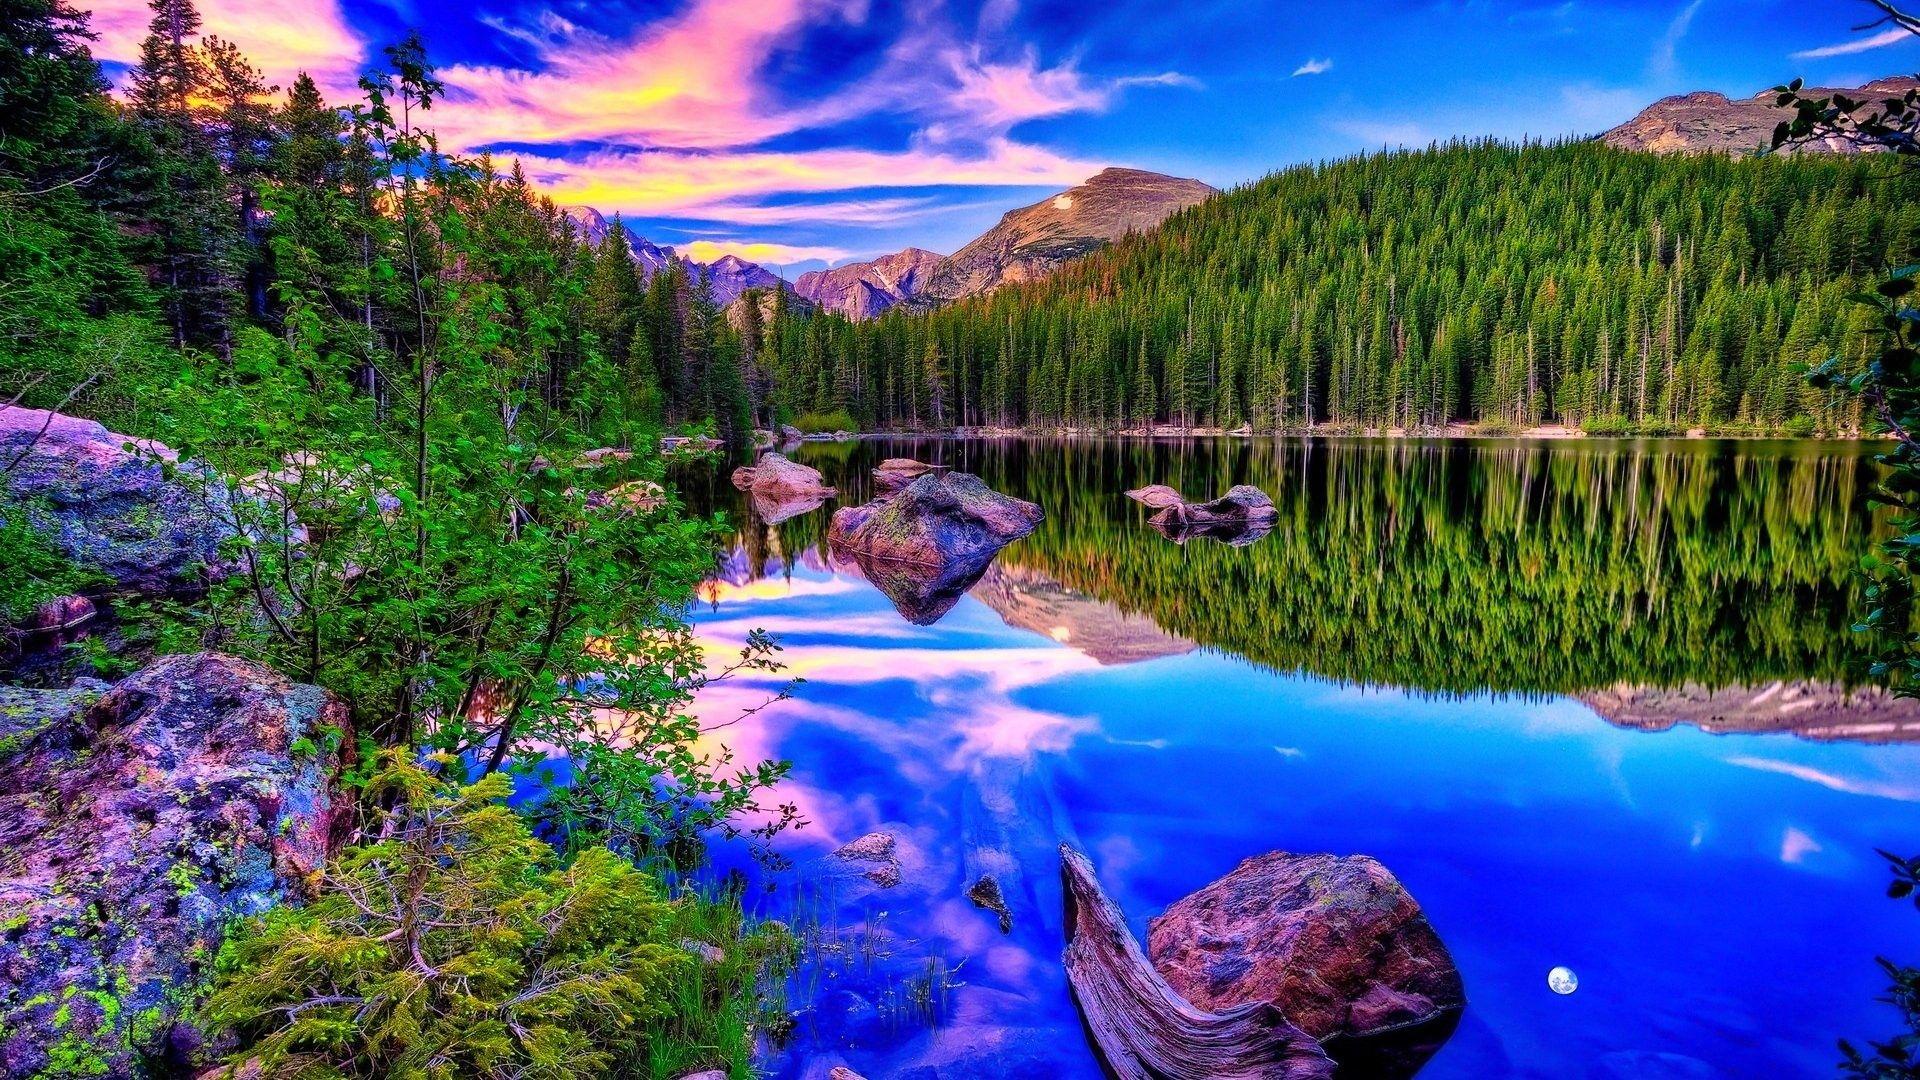 Nature Photo Hd laptop background